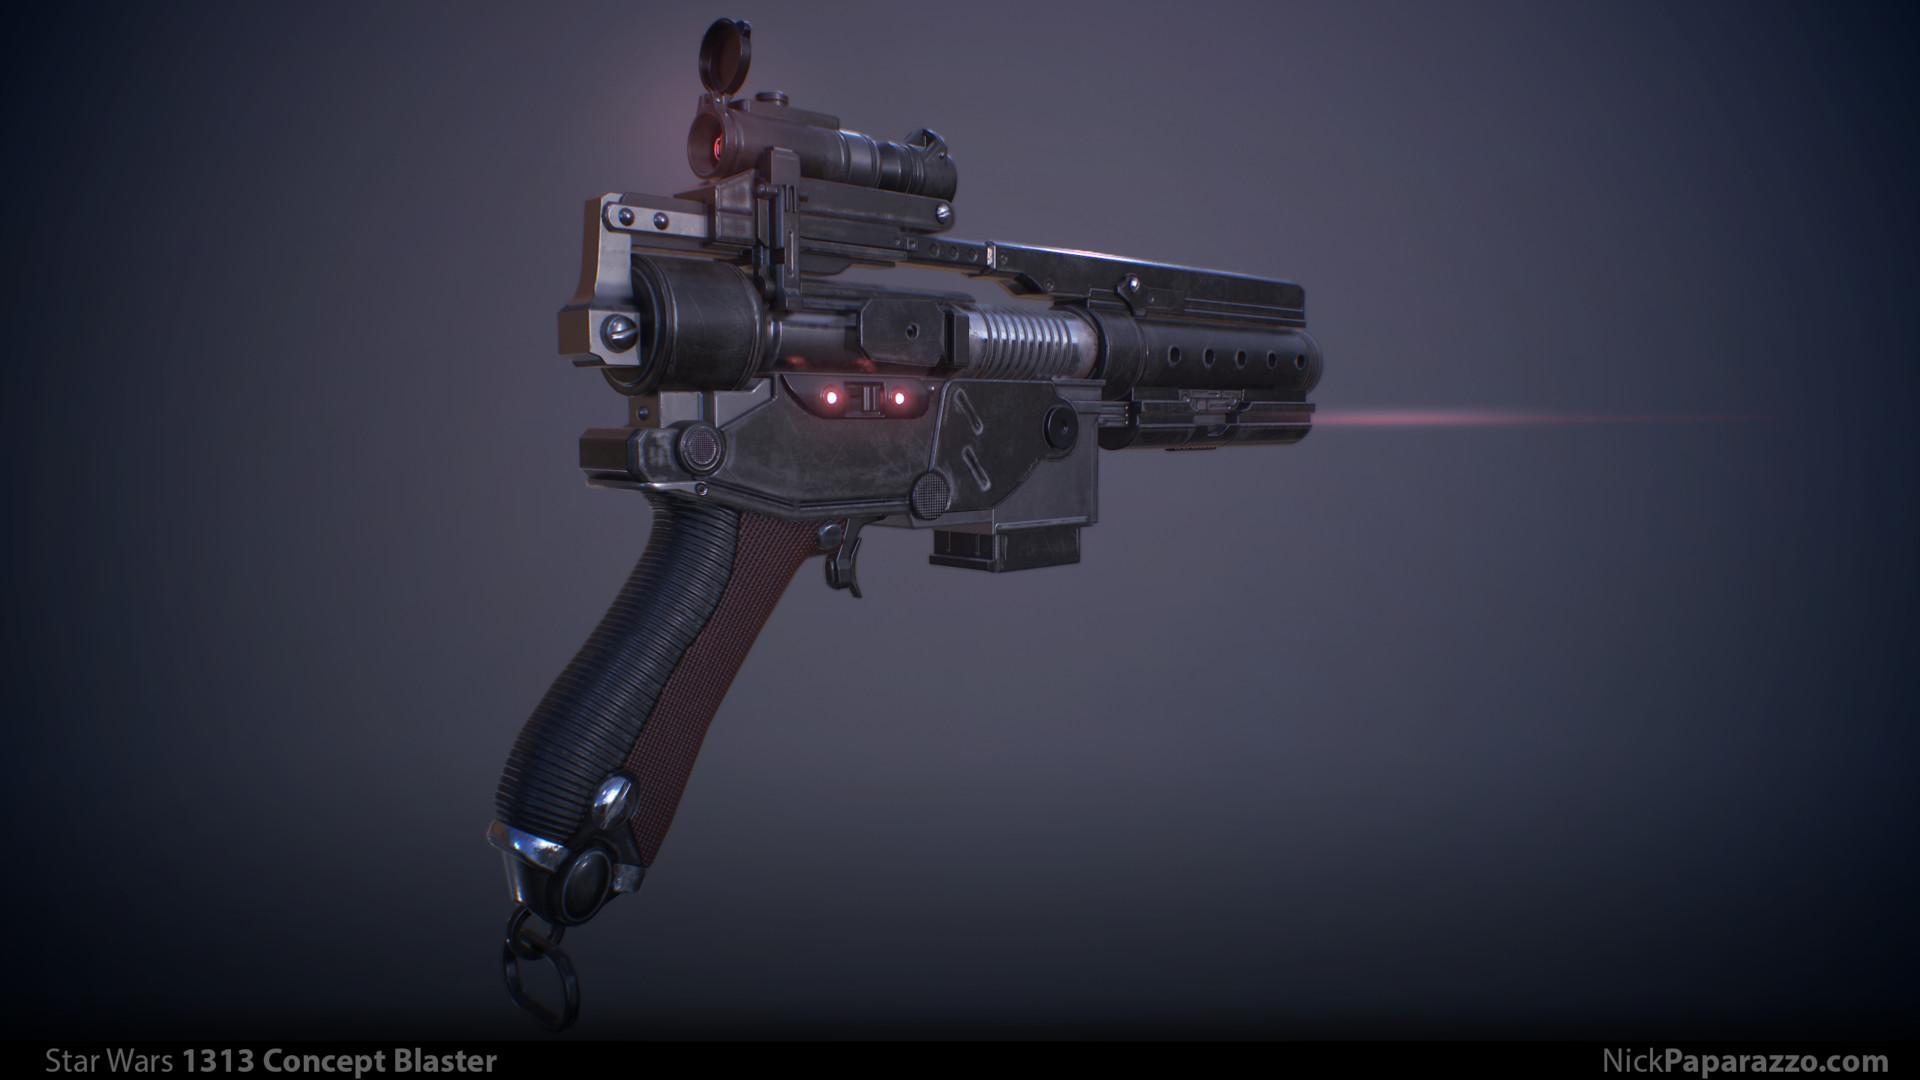 ArtStation - Star Wars 1313 Concept Blaster , Nick Paparazzo